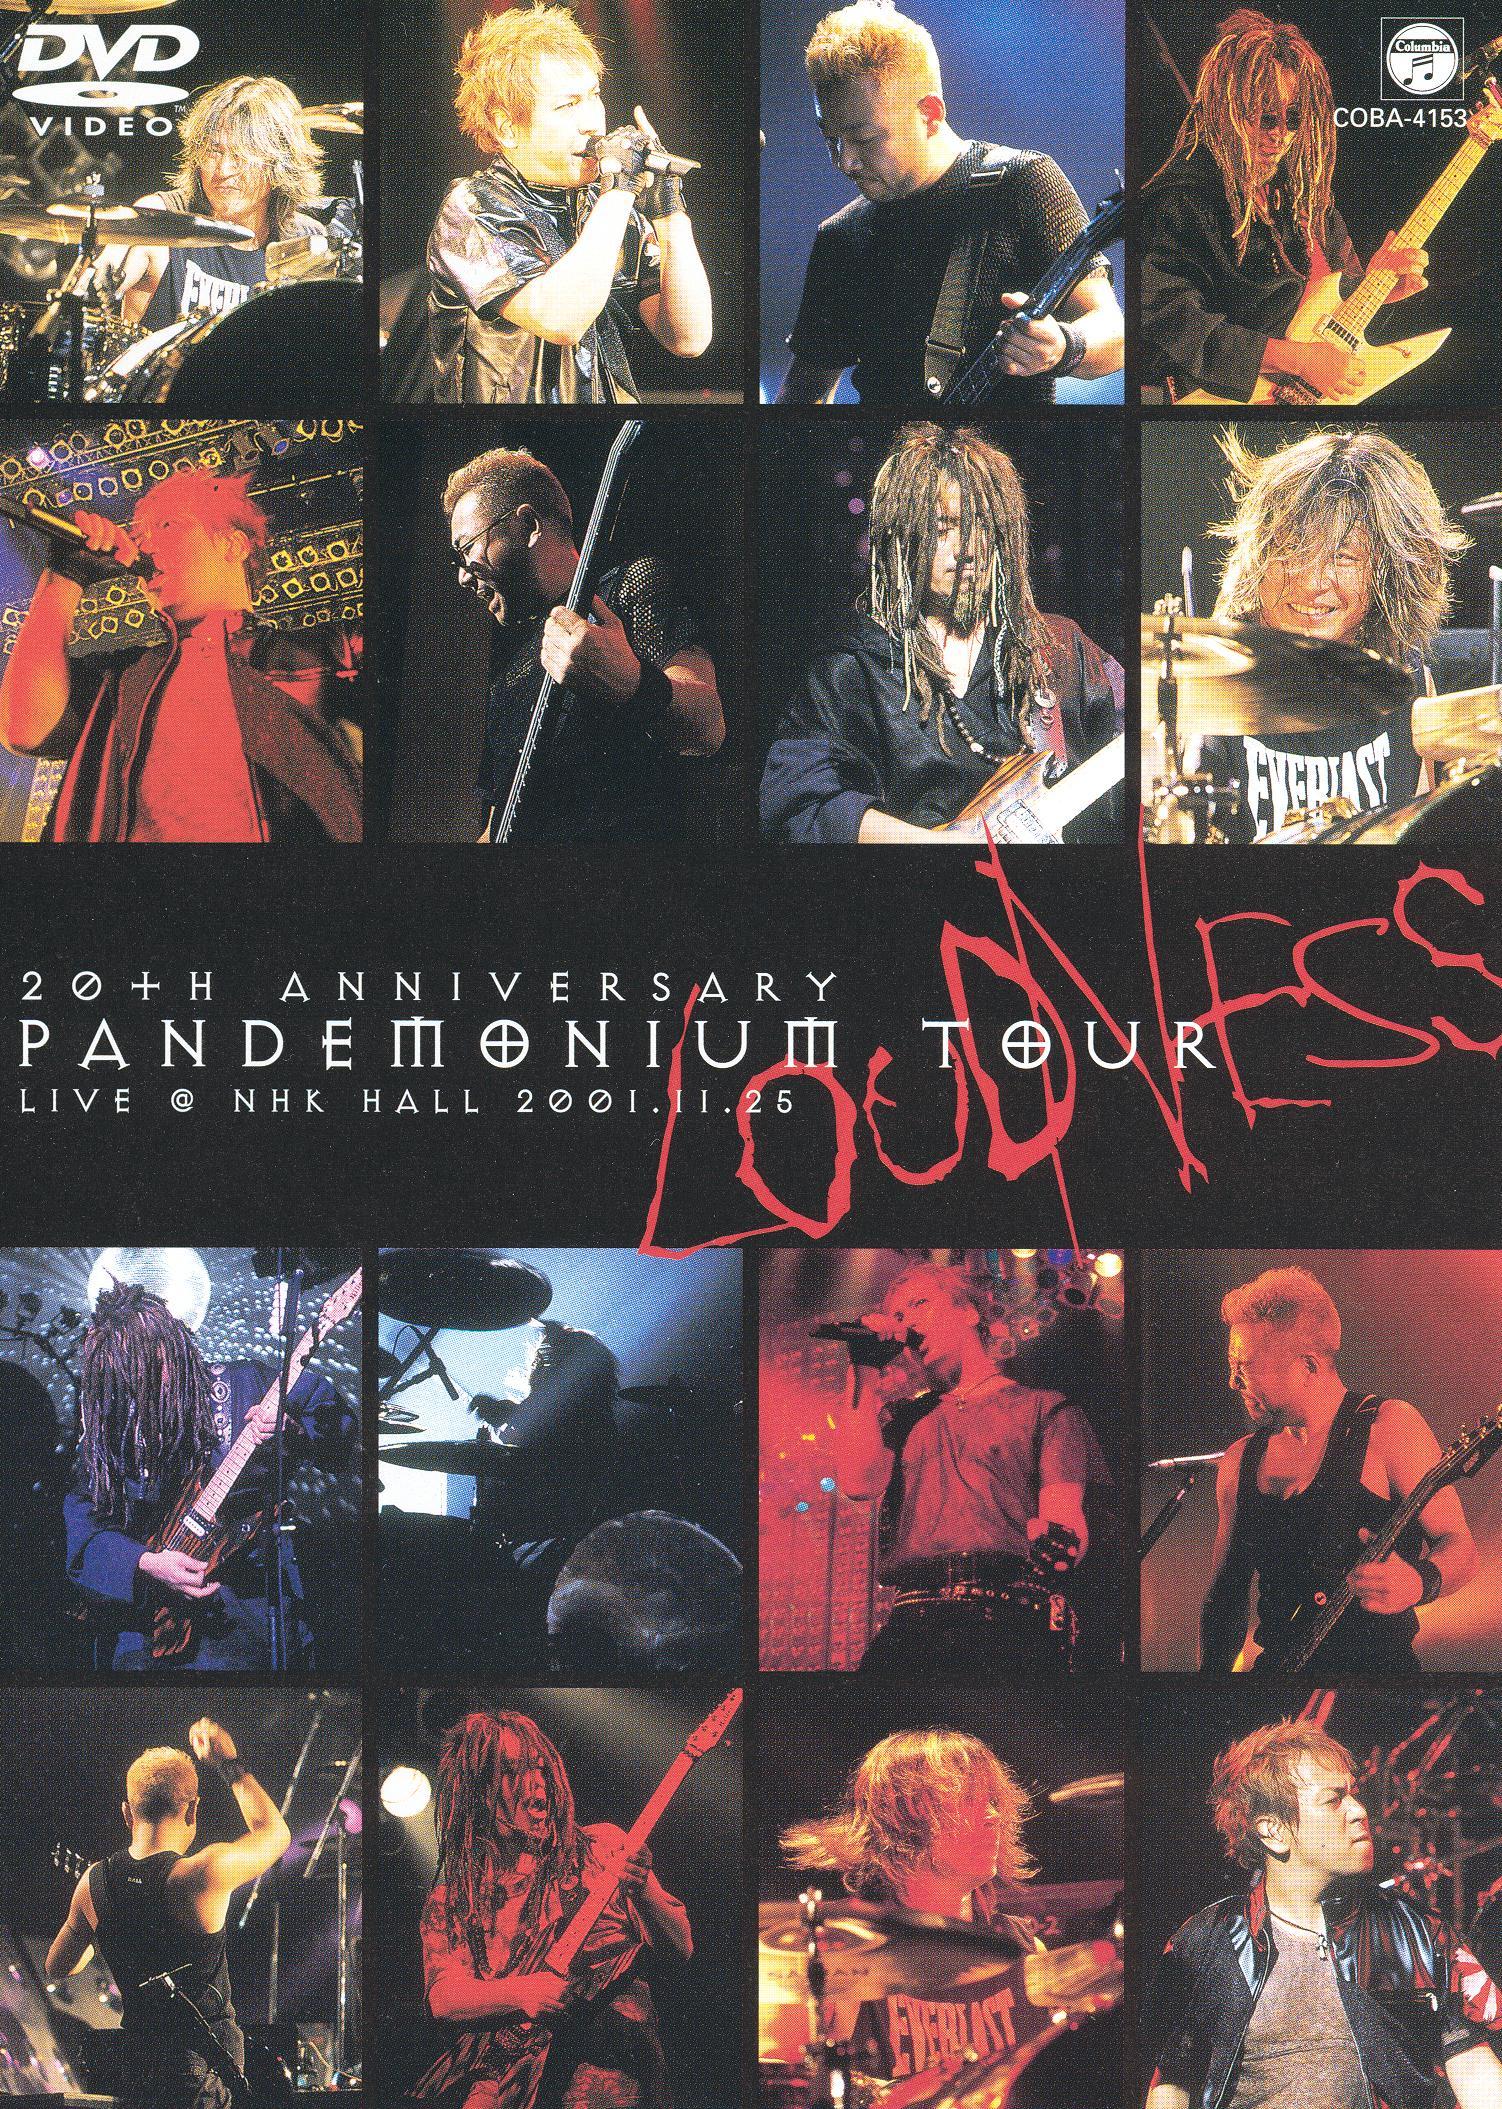 Loudness: 20th Anniversary Pandemonium Tour